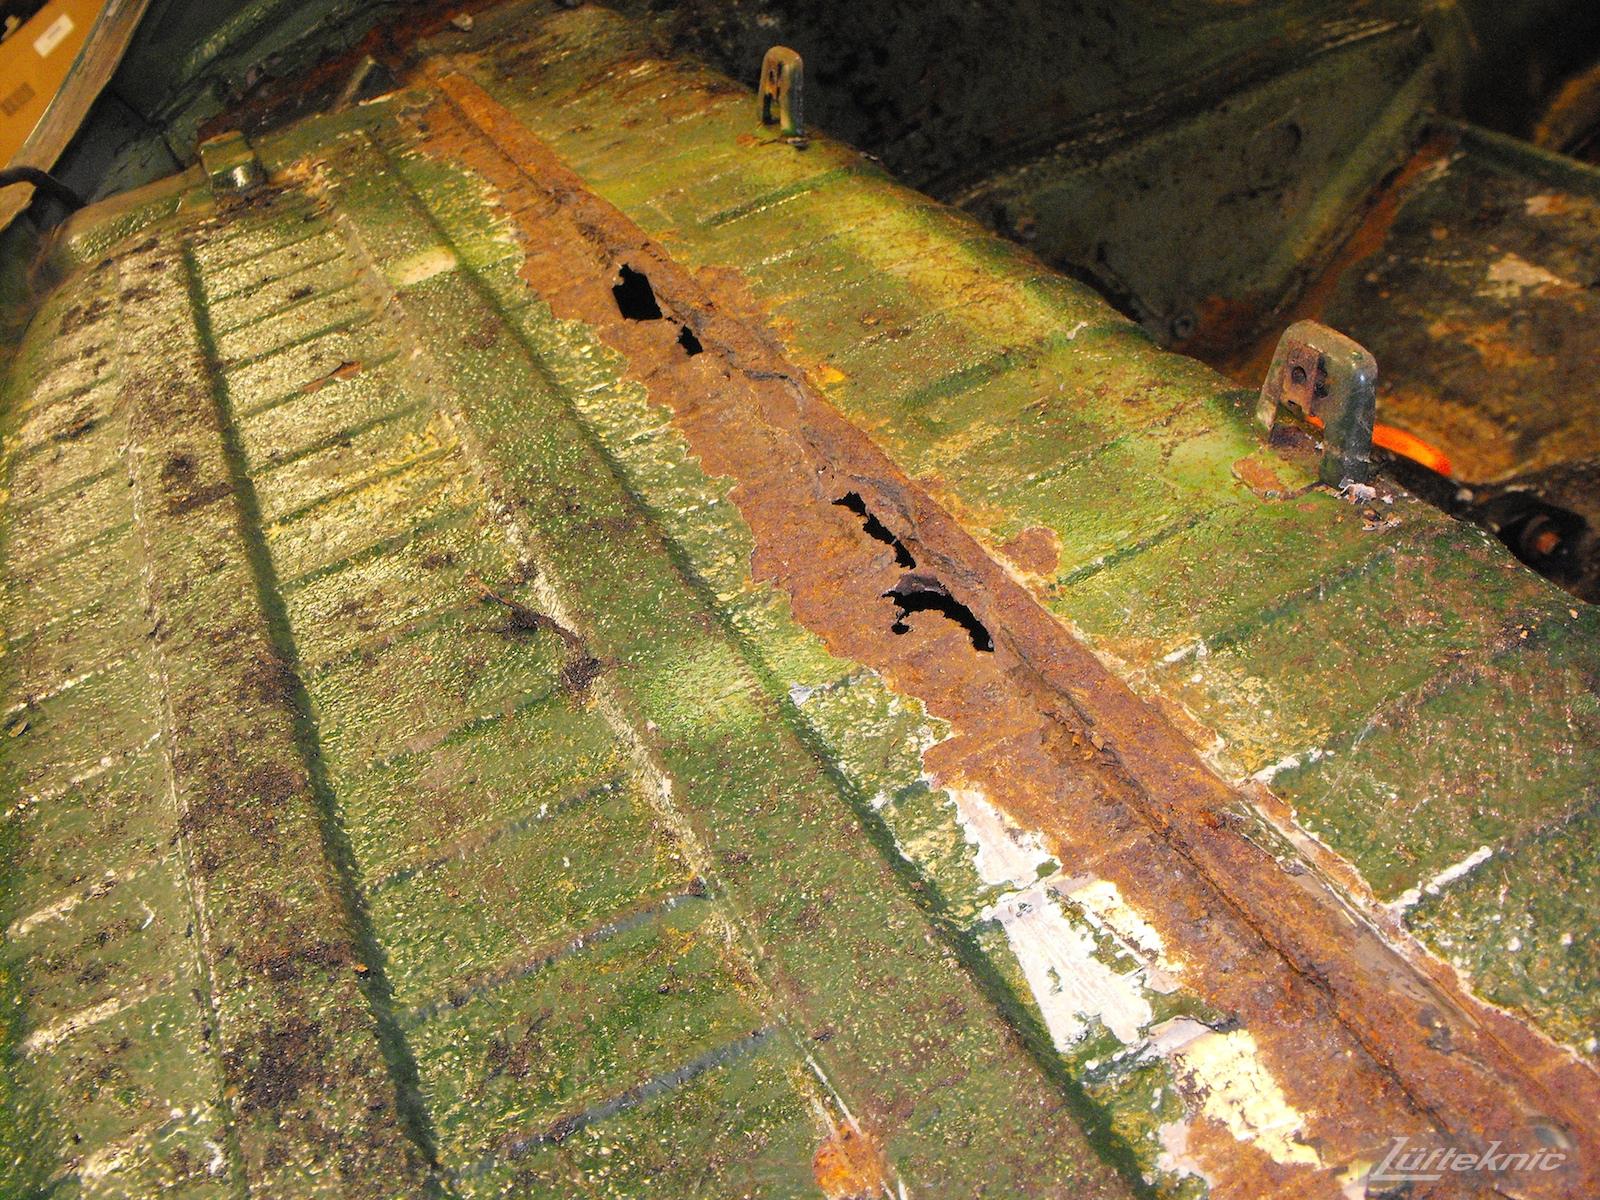 Rear decklid rust shown on an Irish Green Porsche 912 undergoing restoration at Lufteknic.